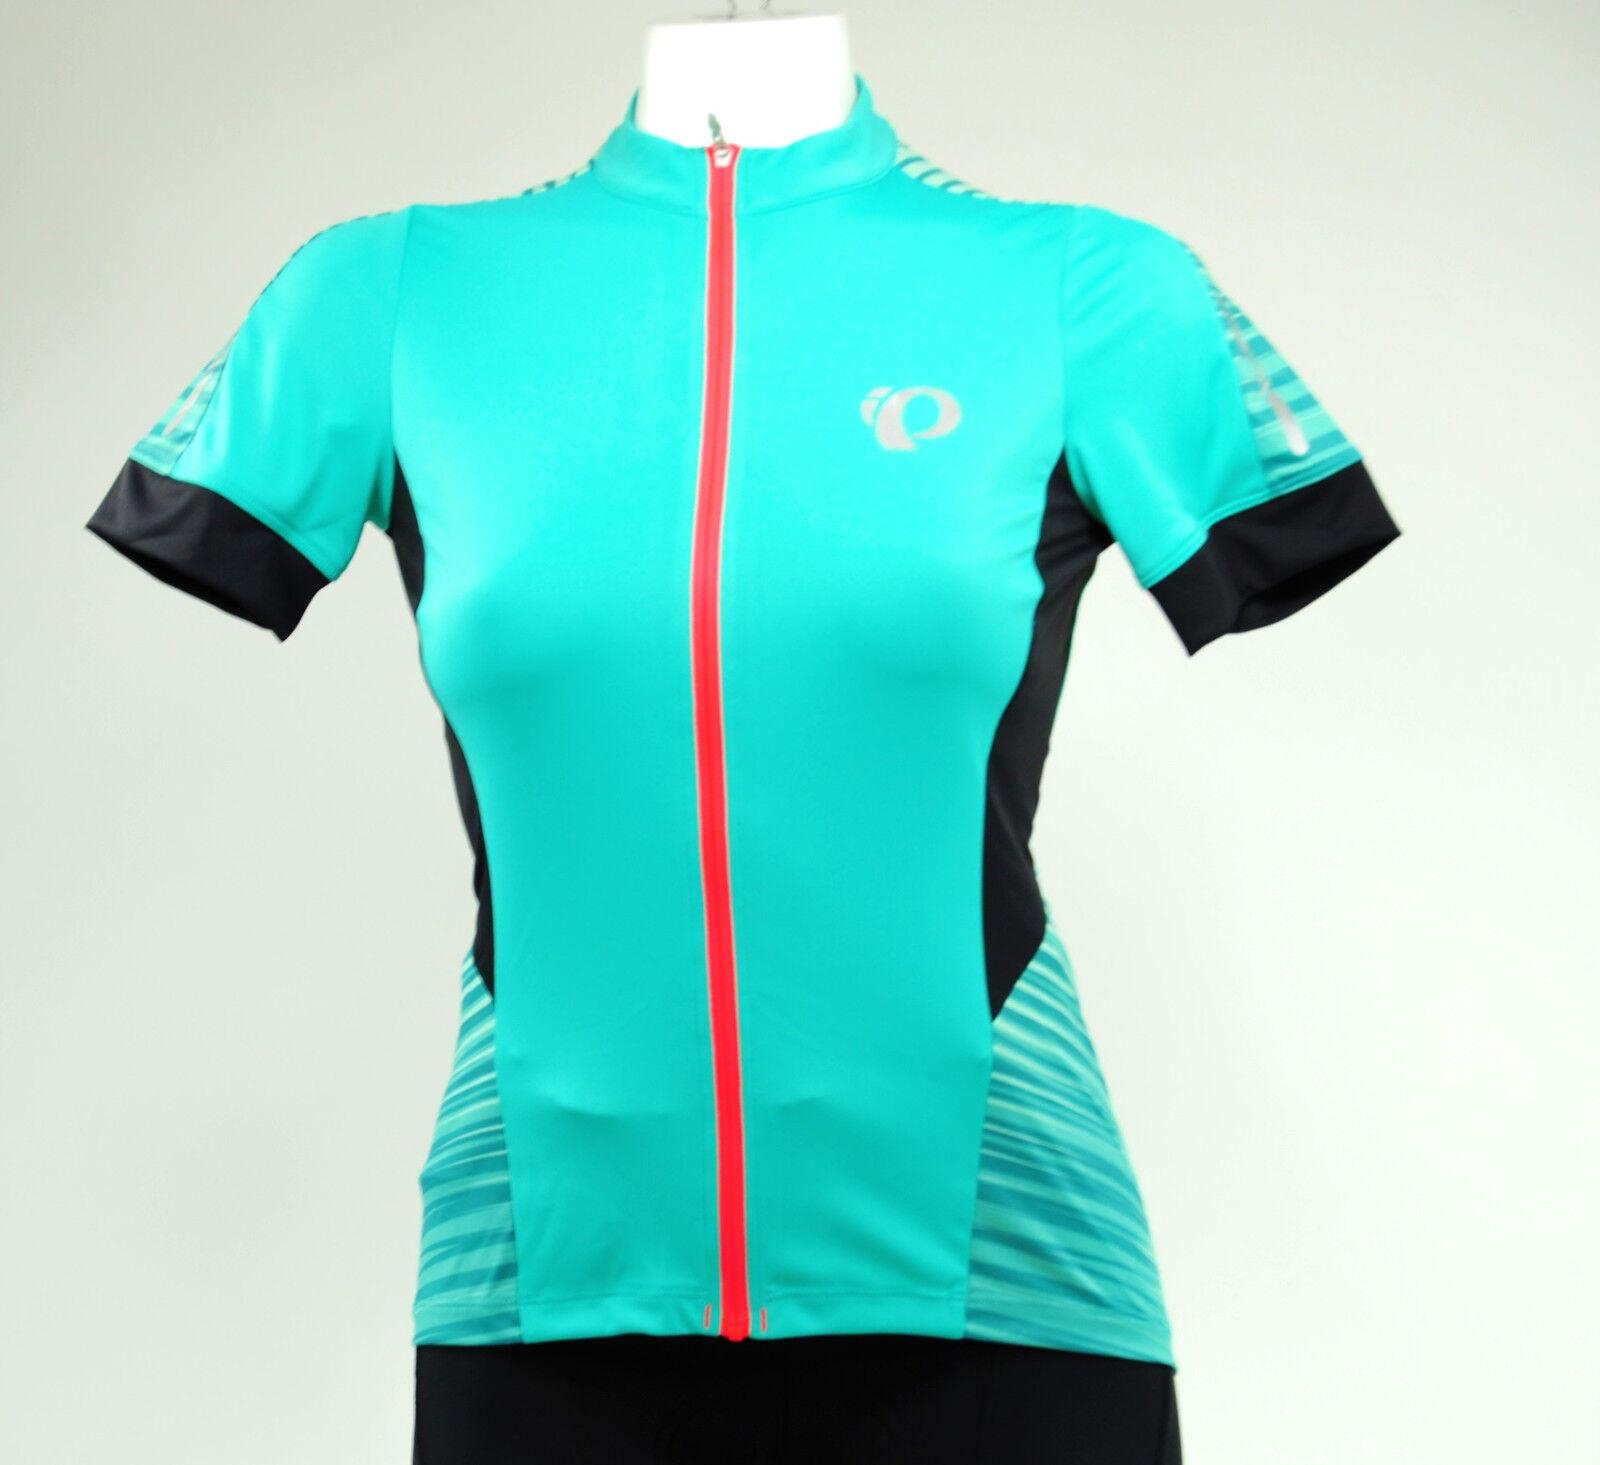 Pearl Izumi Women's Elite Pursuit SS Cycling Jersey, Atlantis Rush, Size XS